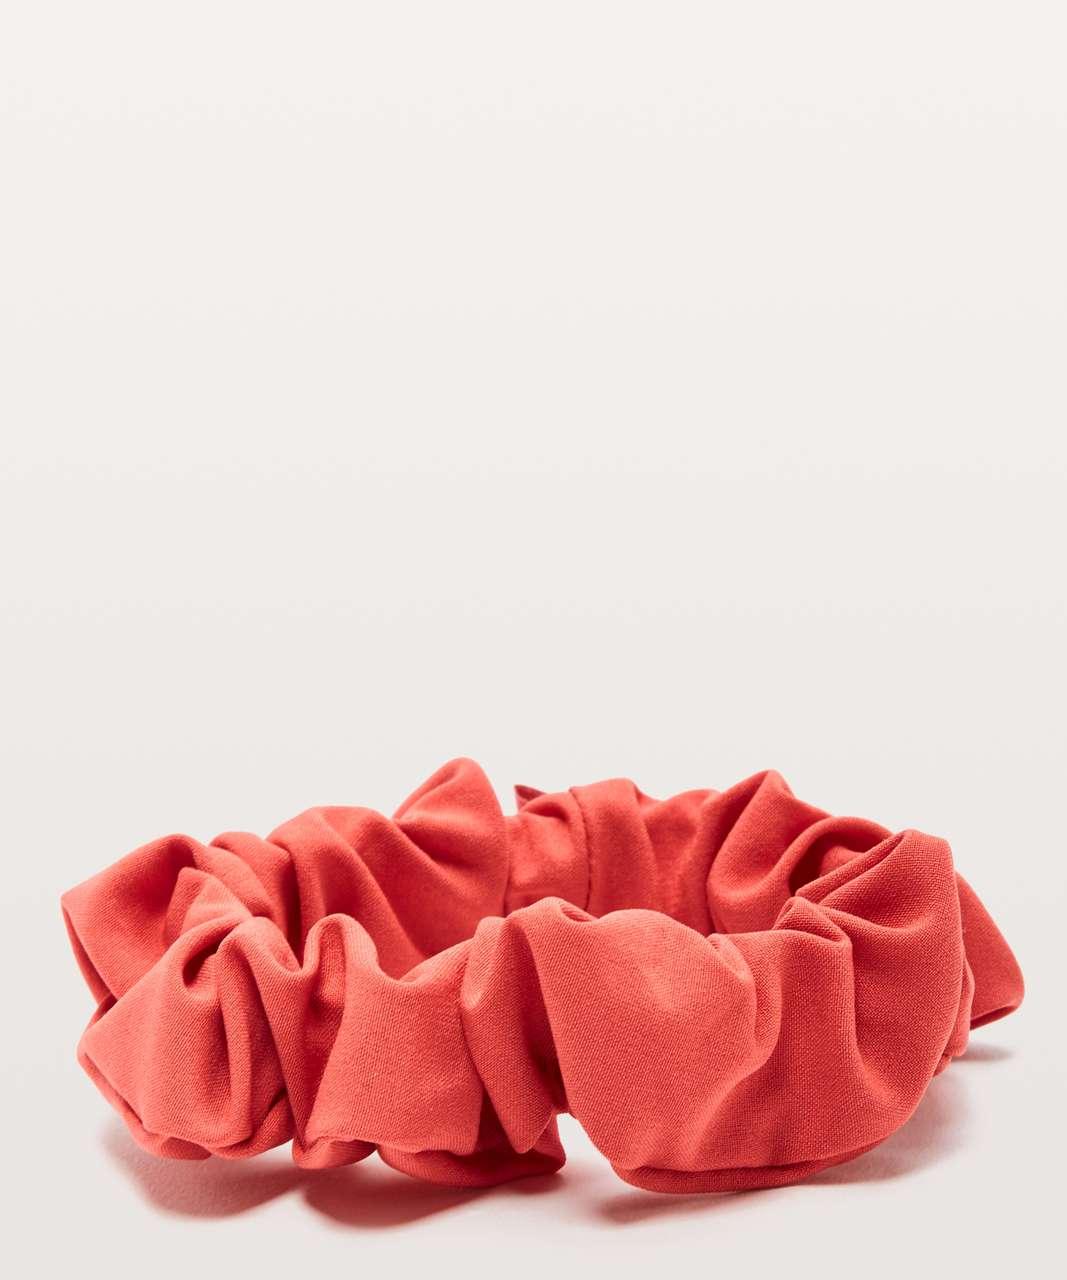 Lululemon Uplifting Scrunchie - Poppy Coral